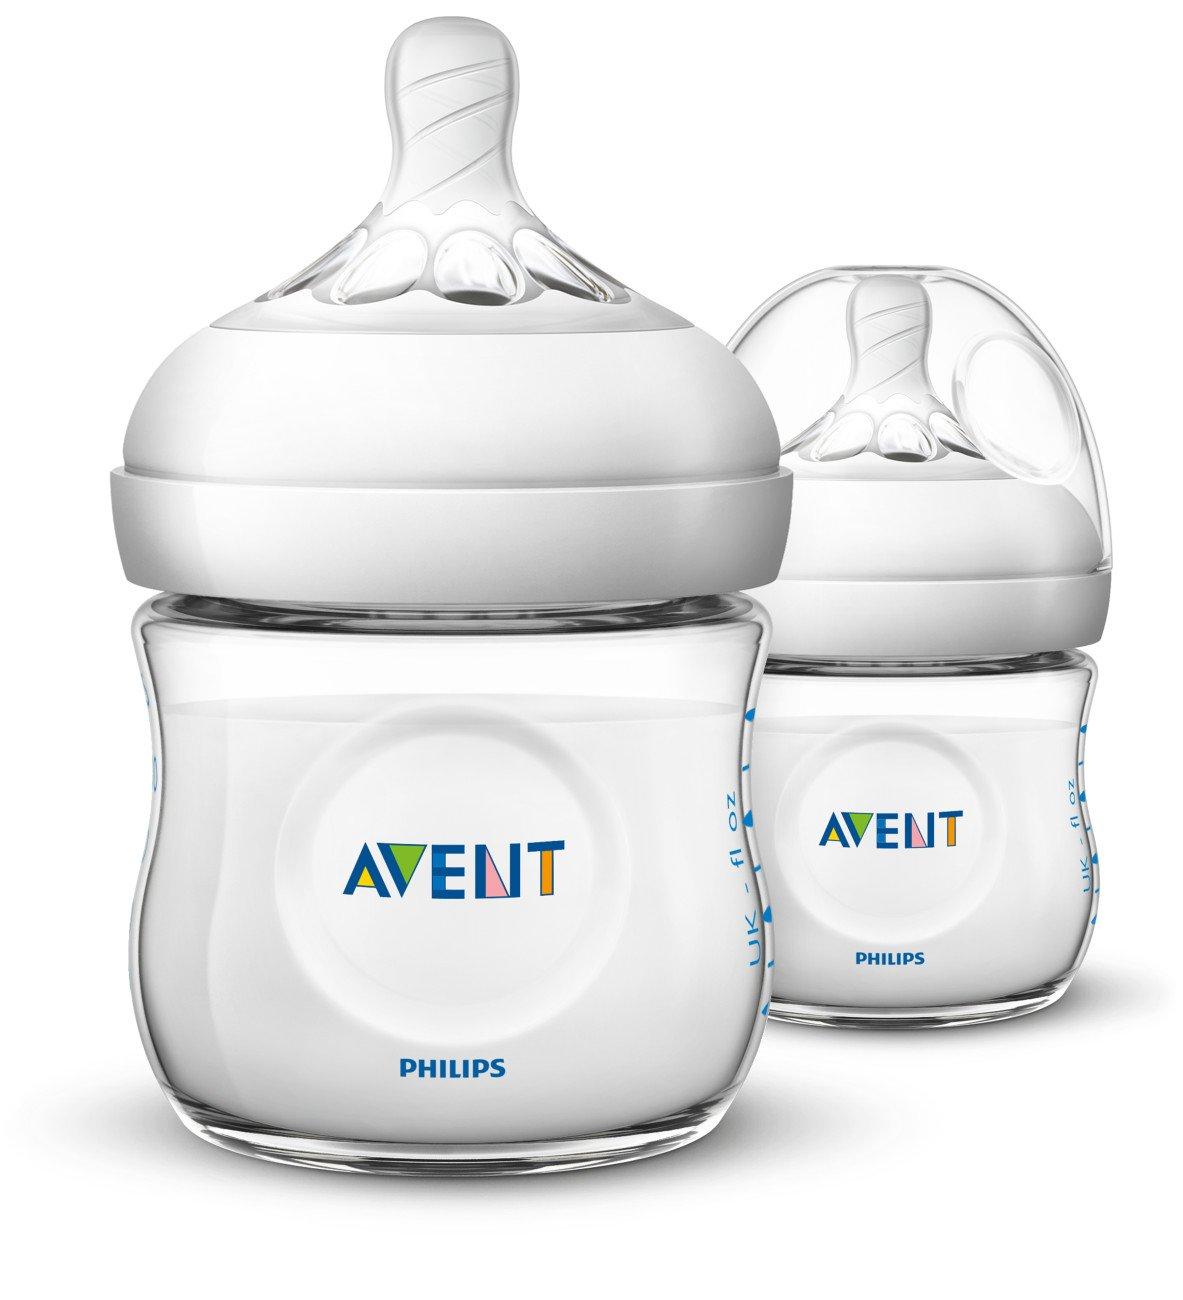 Philips Avent Natural Baby Bottle, Clear, 4oz, 2pk, SCF010/27